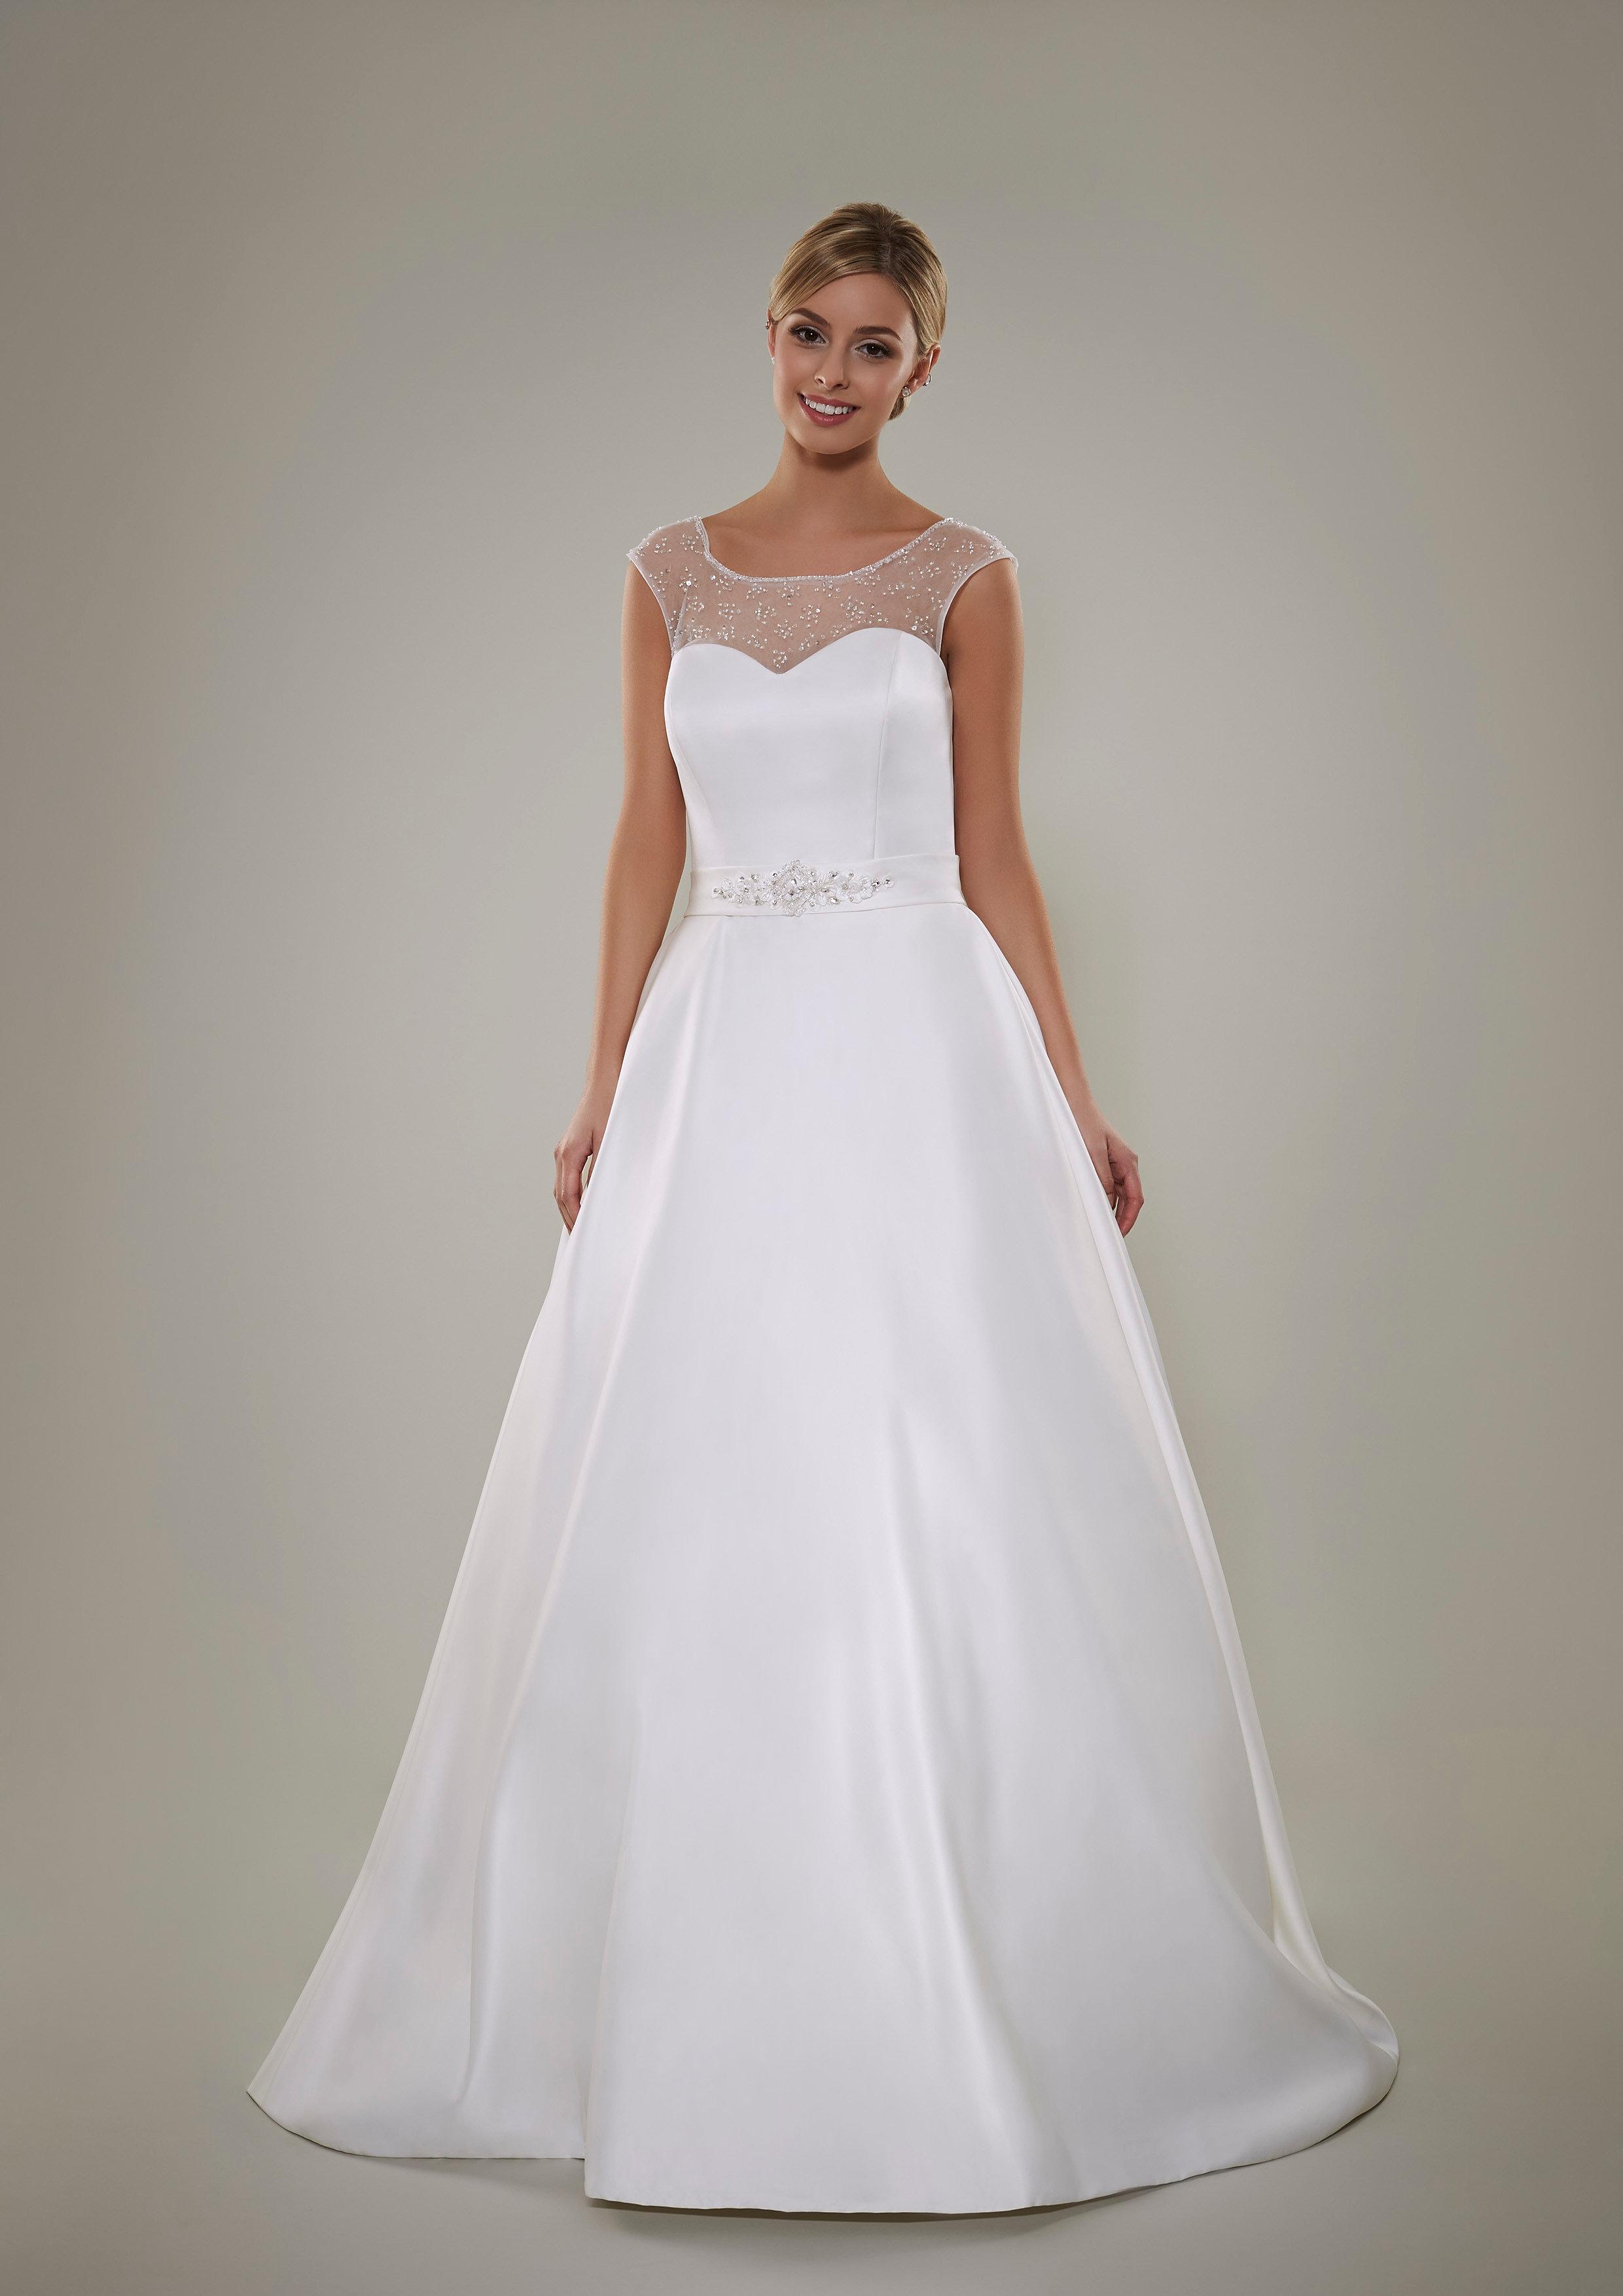 Bridesmaids dresses glasgow 28 images bridesmaid dresses bridesmaids dresses glasgow envious bridal wedding bridesmaid dresses in glasgow ombrellifo Images